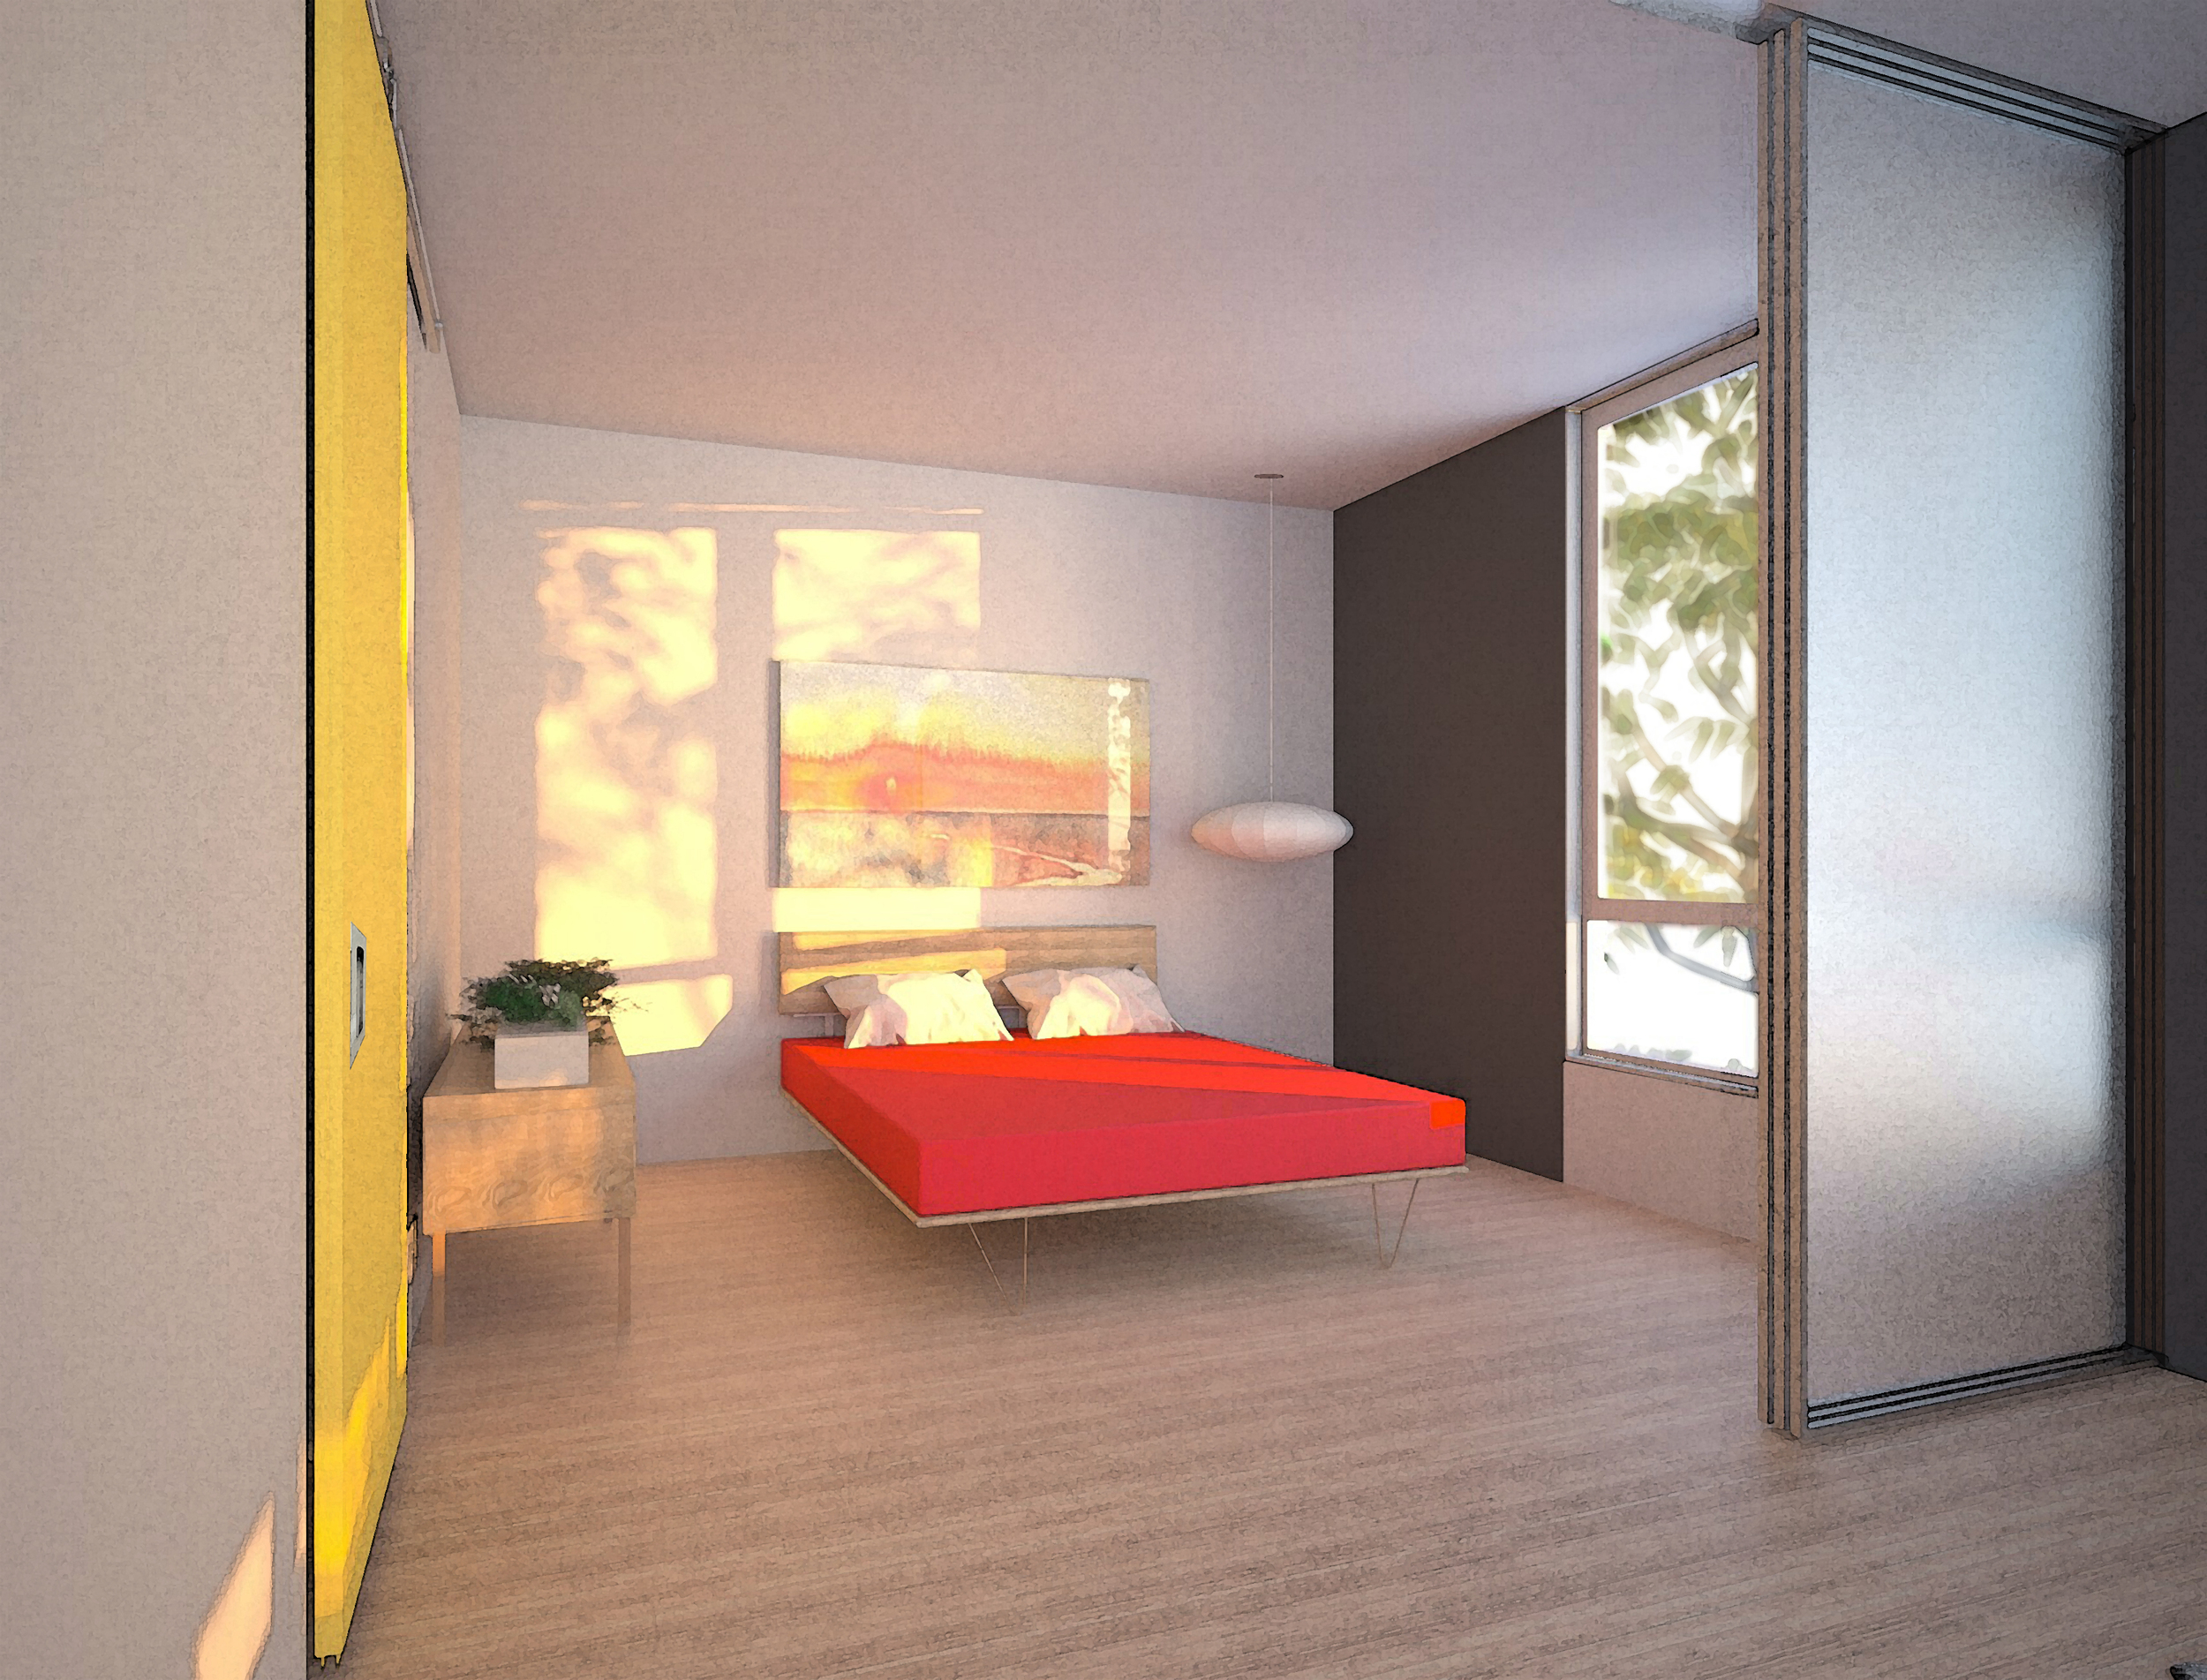 44h int_bedroom.jpg